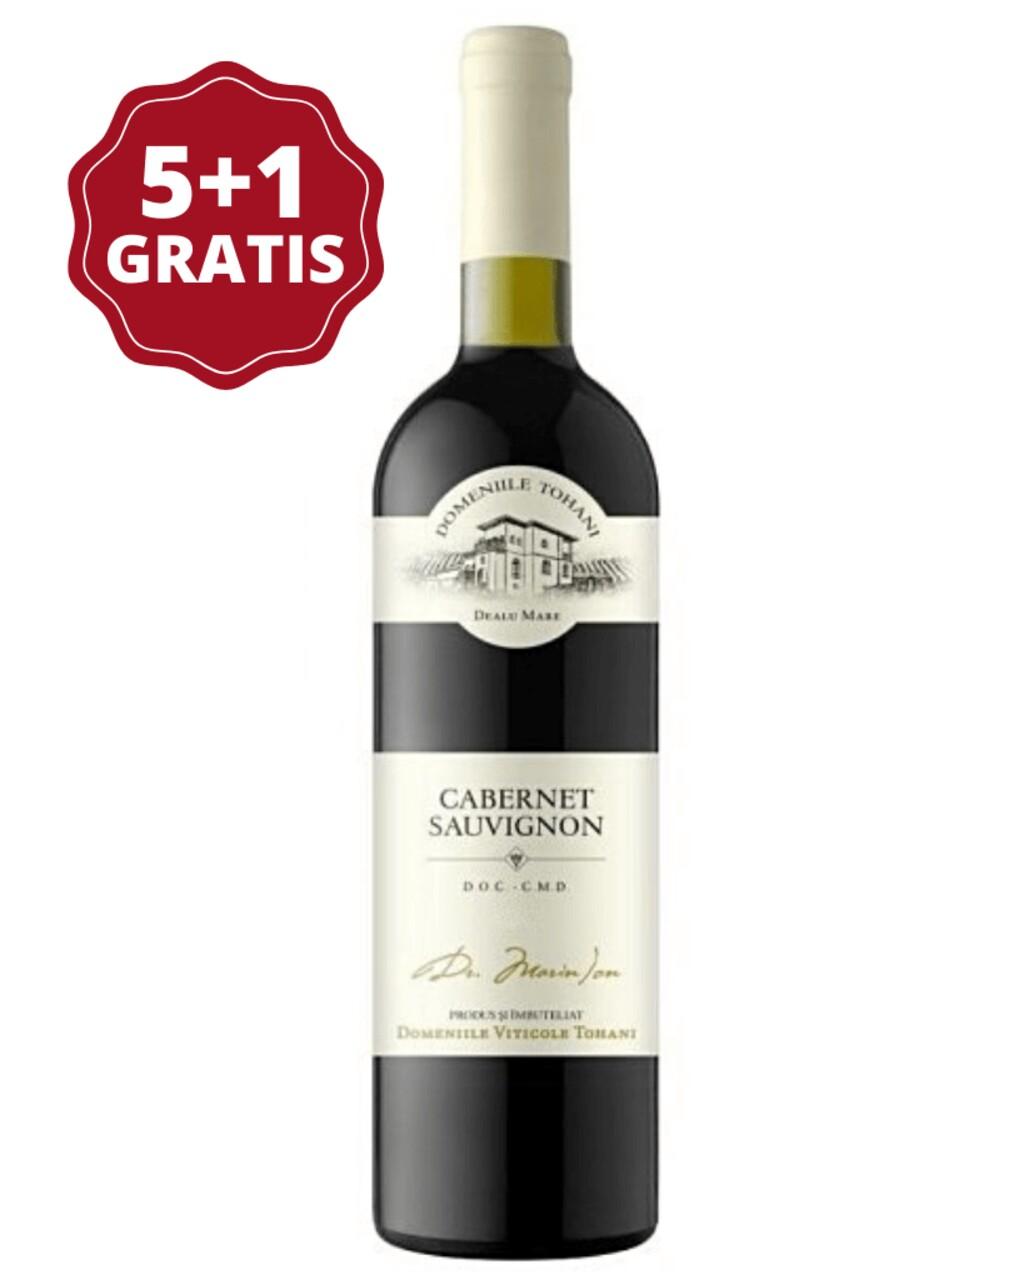 Domeniile Tohani Cabernet Sauvignon 5+1